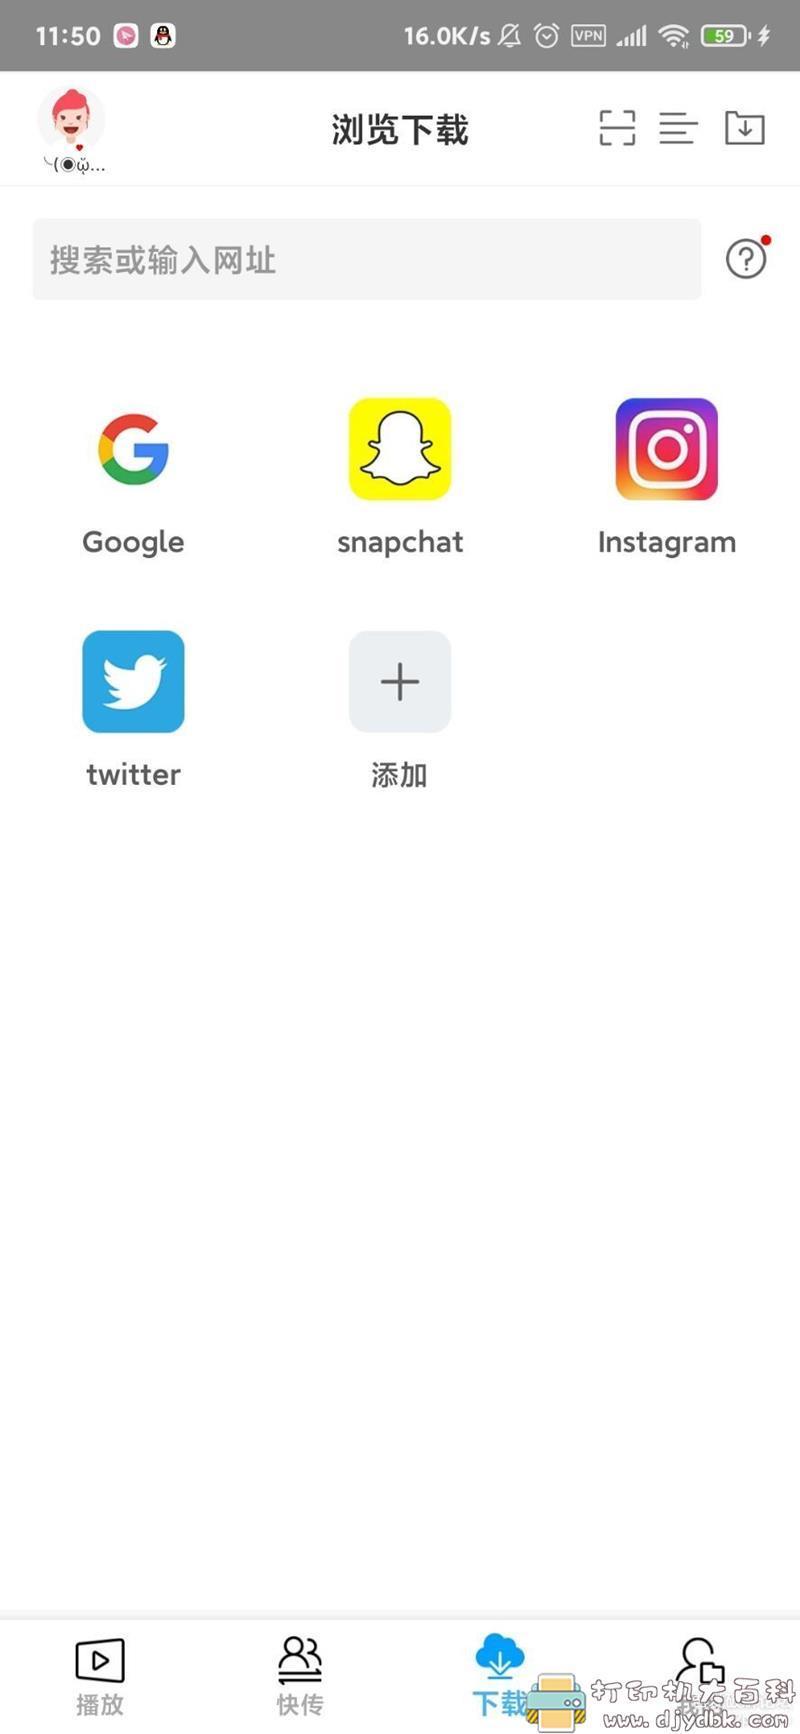 [Android]爱奇艺出品的万能播放和快传工具 万能联播V3.4.151 Googleplay版 配图 No.2